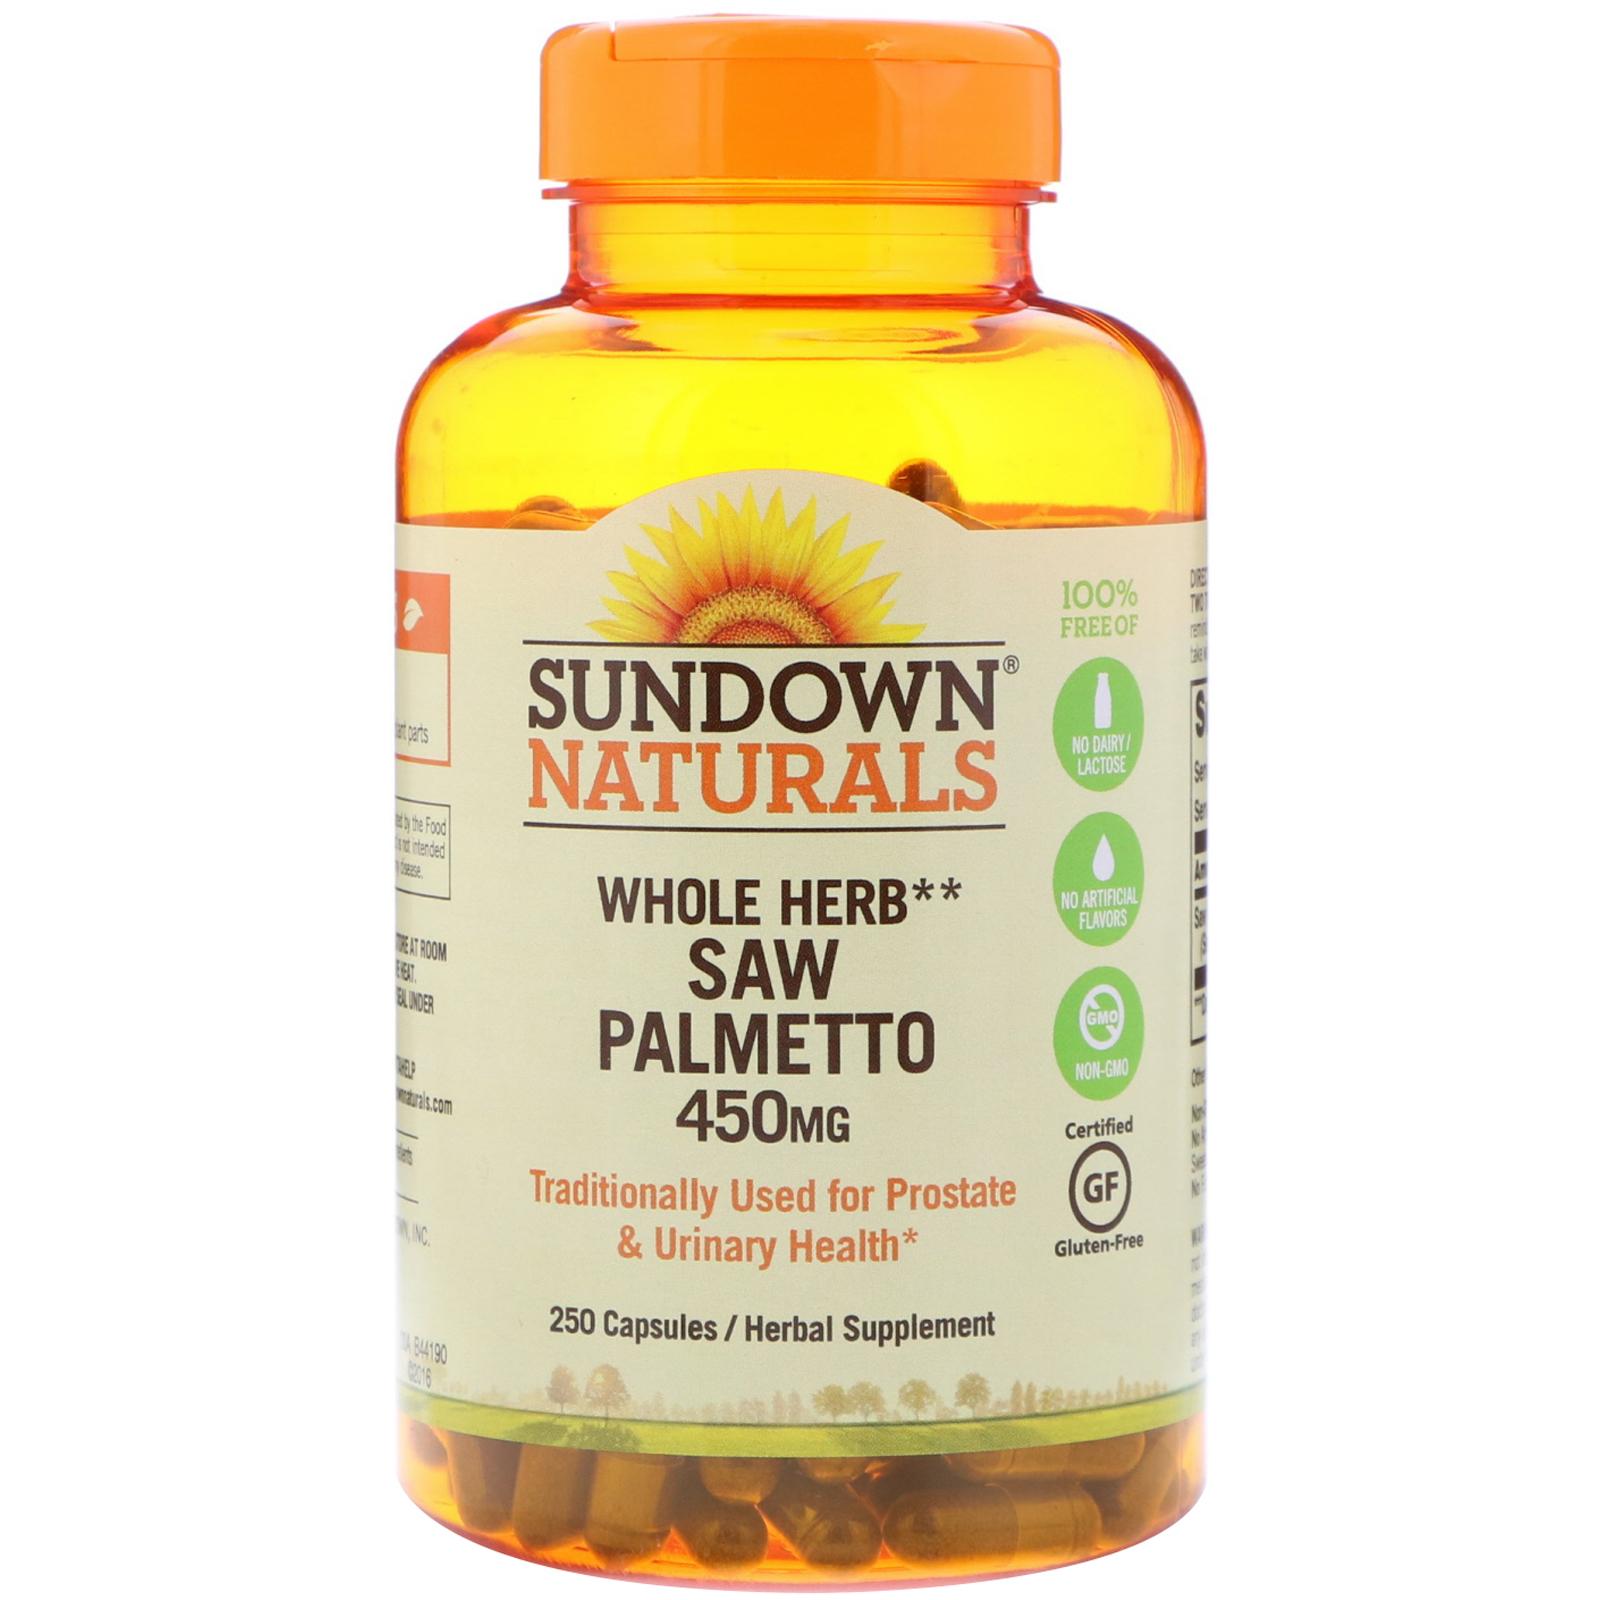 Sundown Naturals Whole Herb Saw Palmetto 450 Mg 250